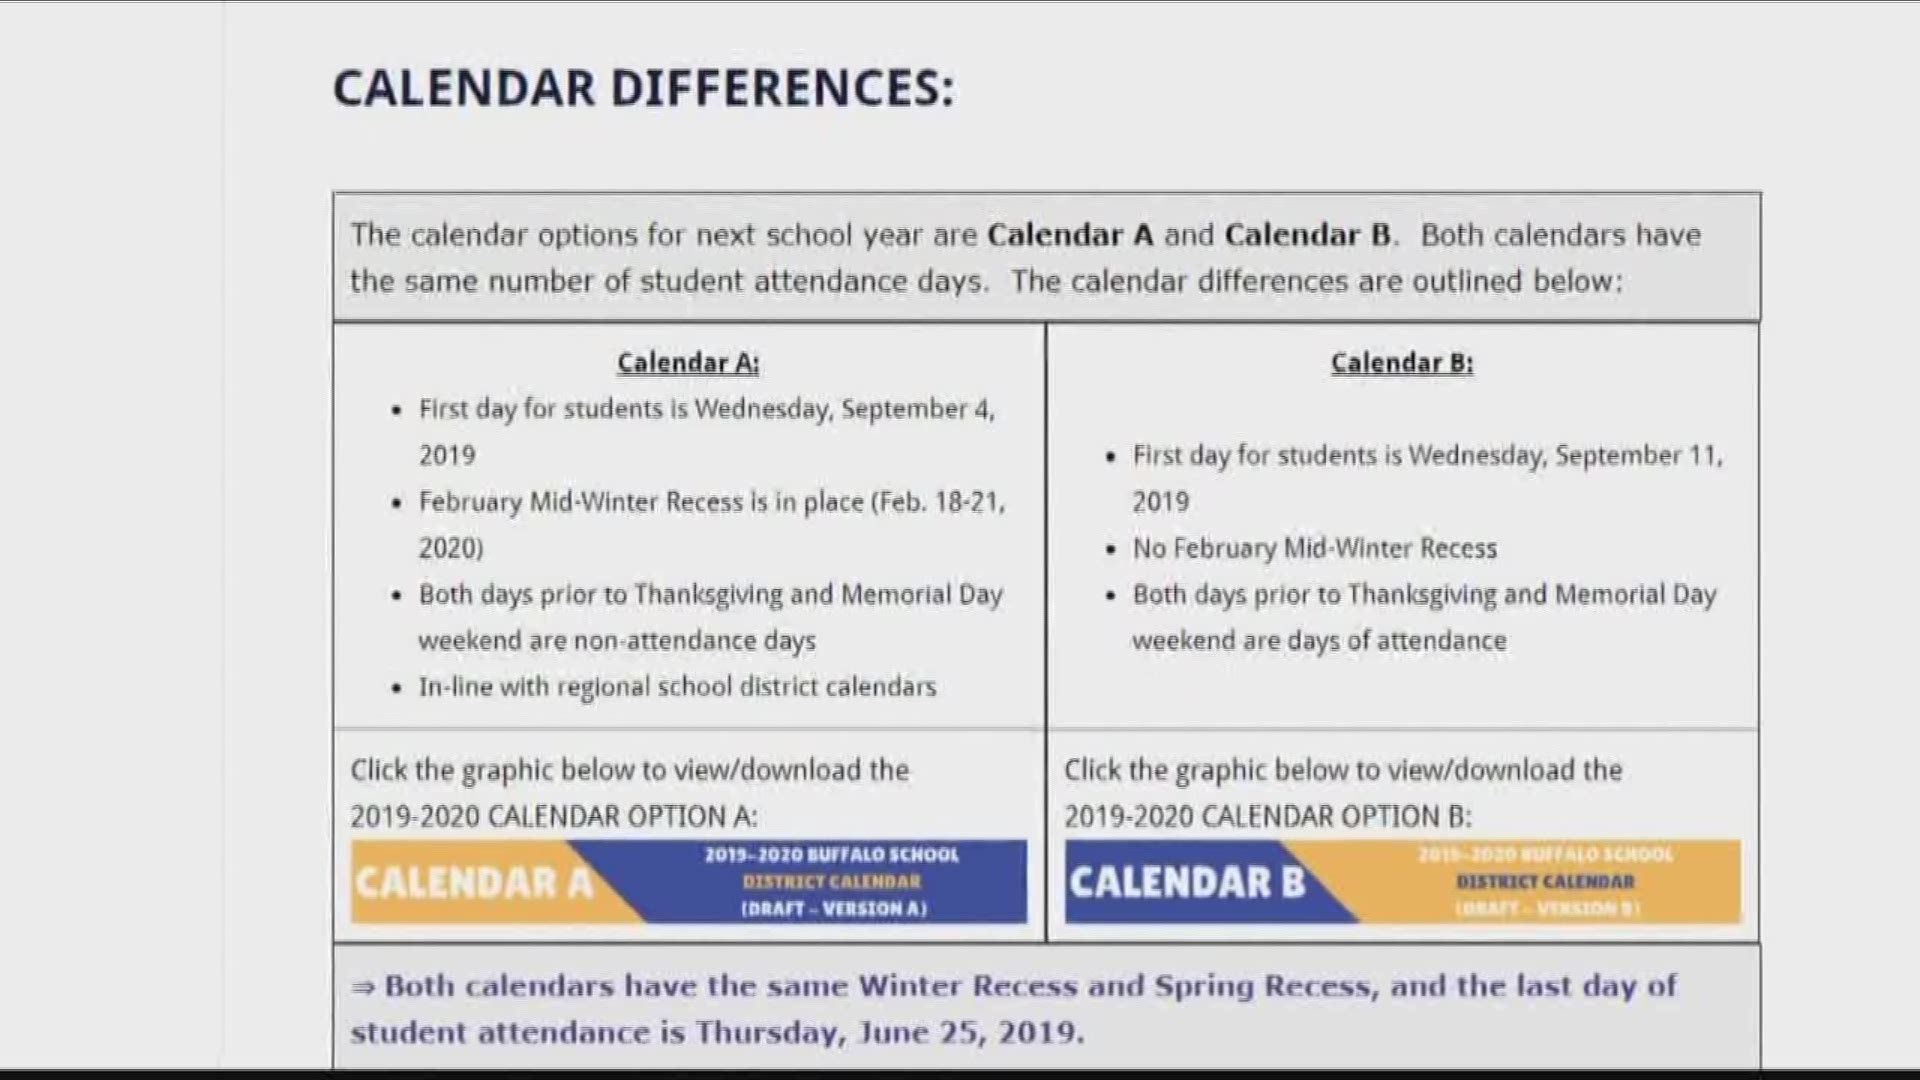 Albany City School District Calendar 2021 | Printable Within University Of Phoenix Academic Calendar 2021